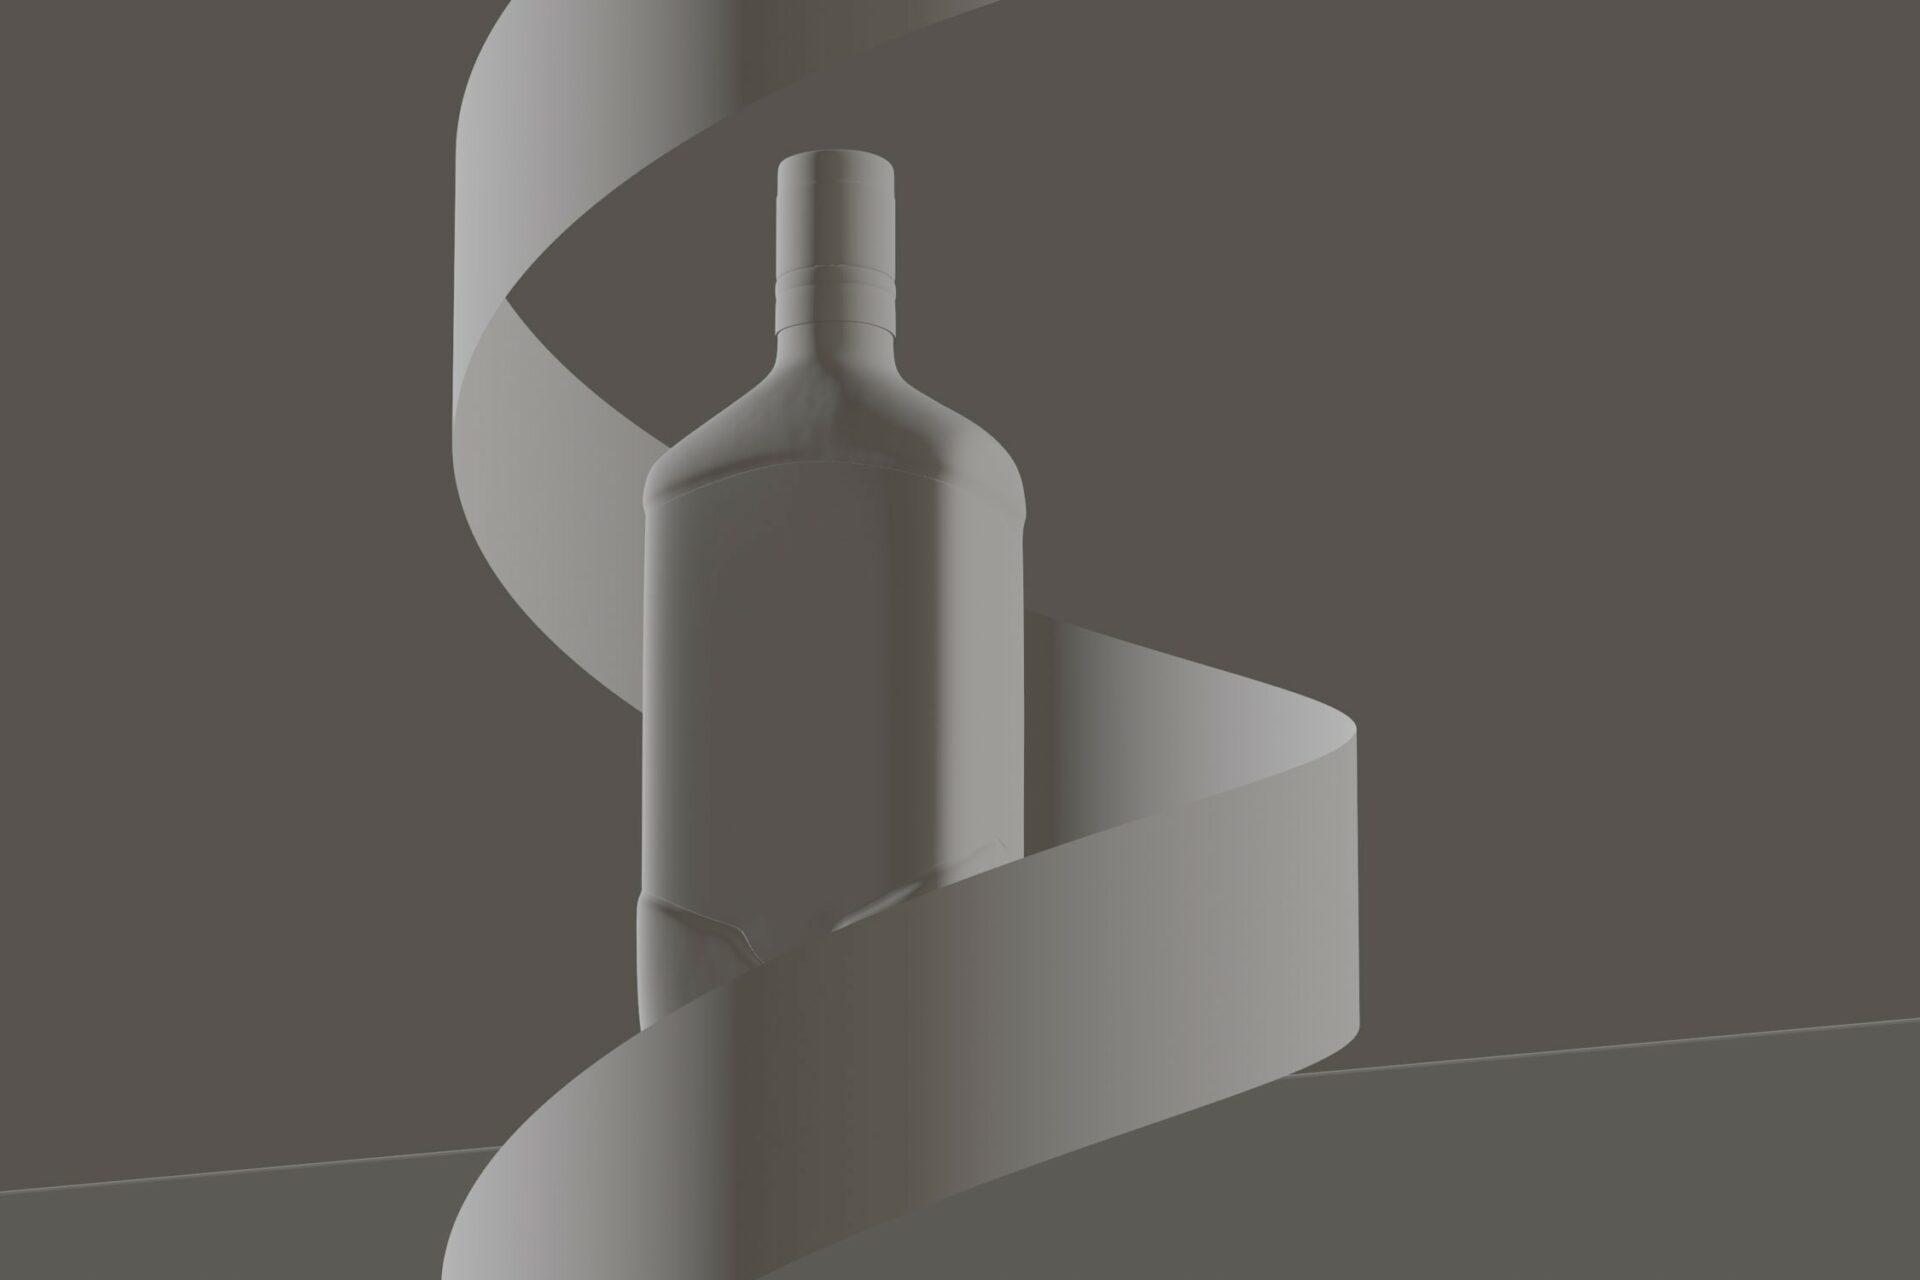 CGI whisky photography